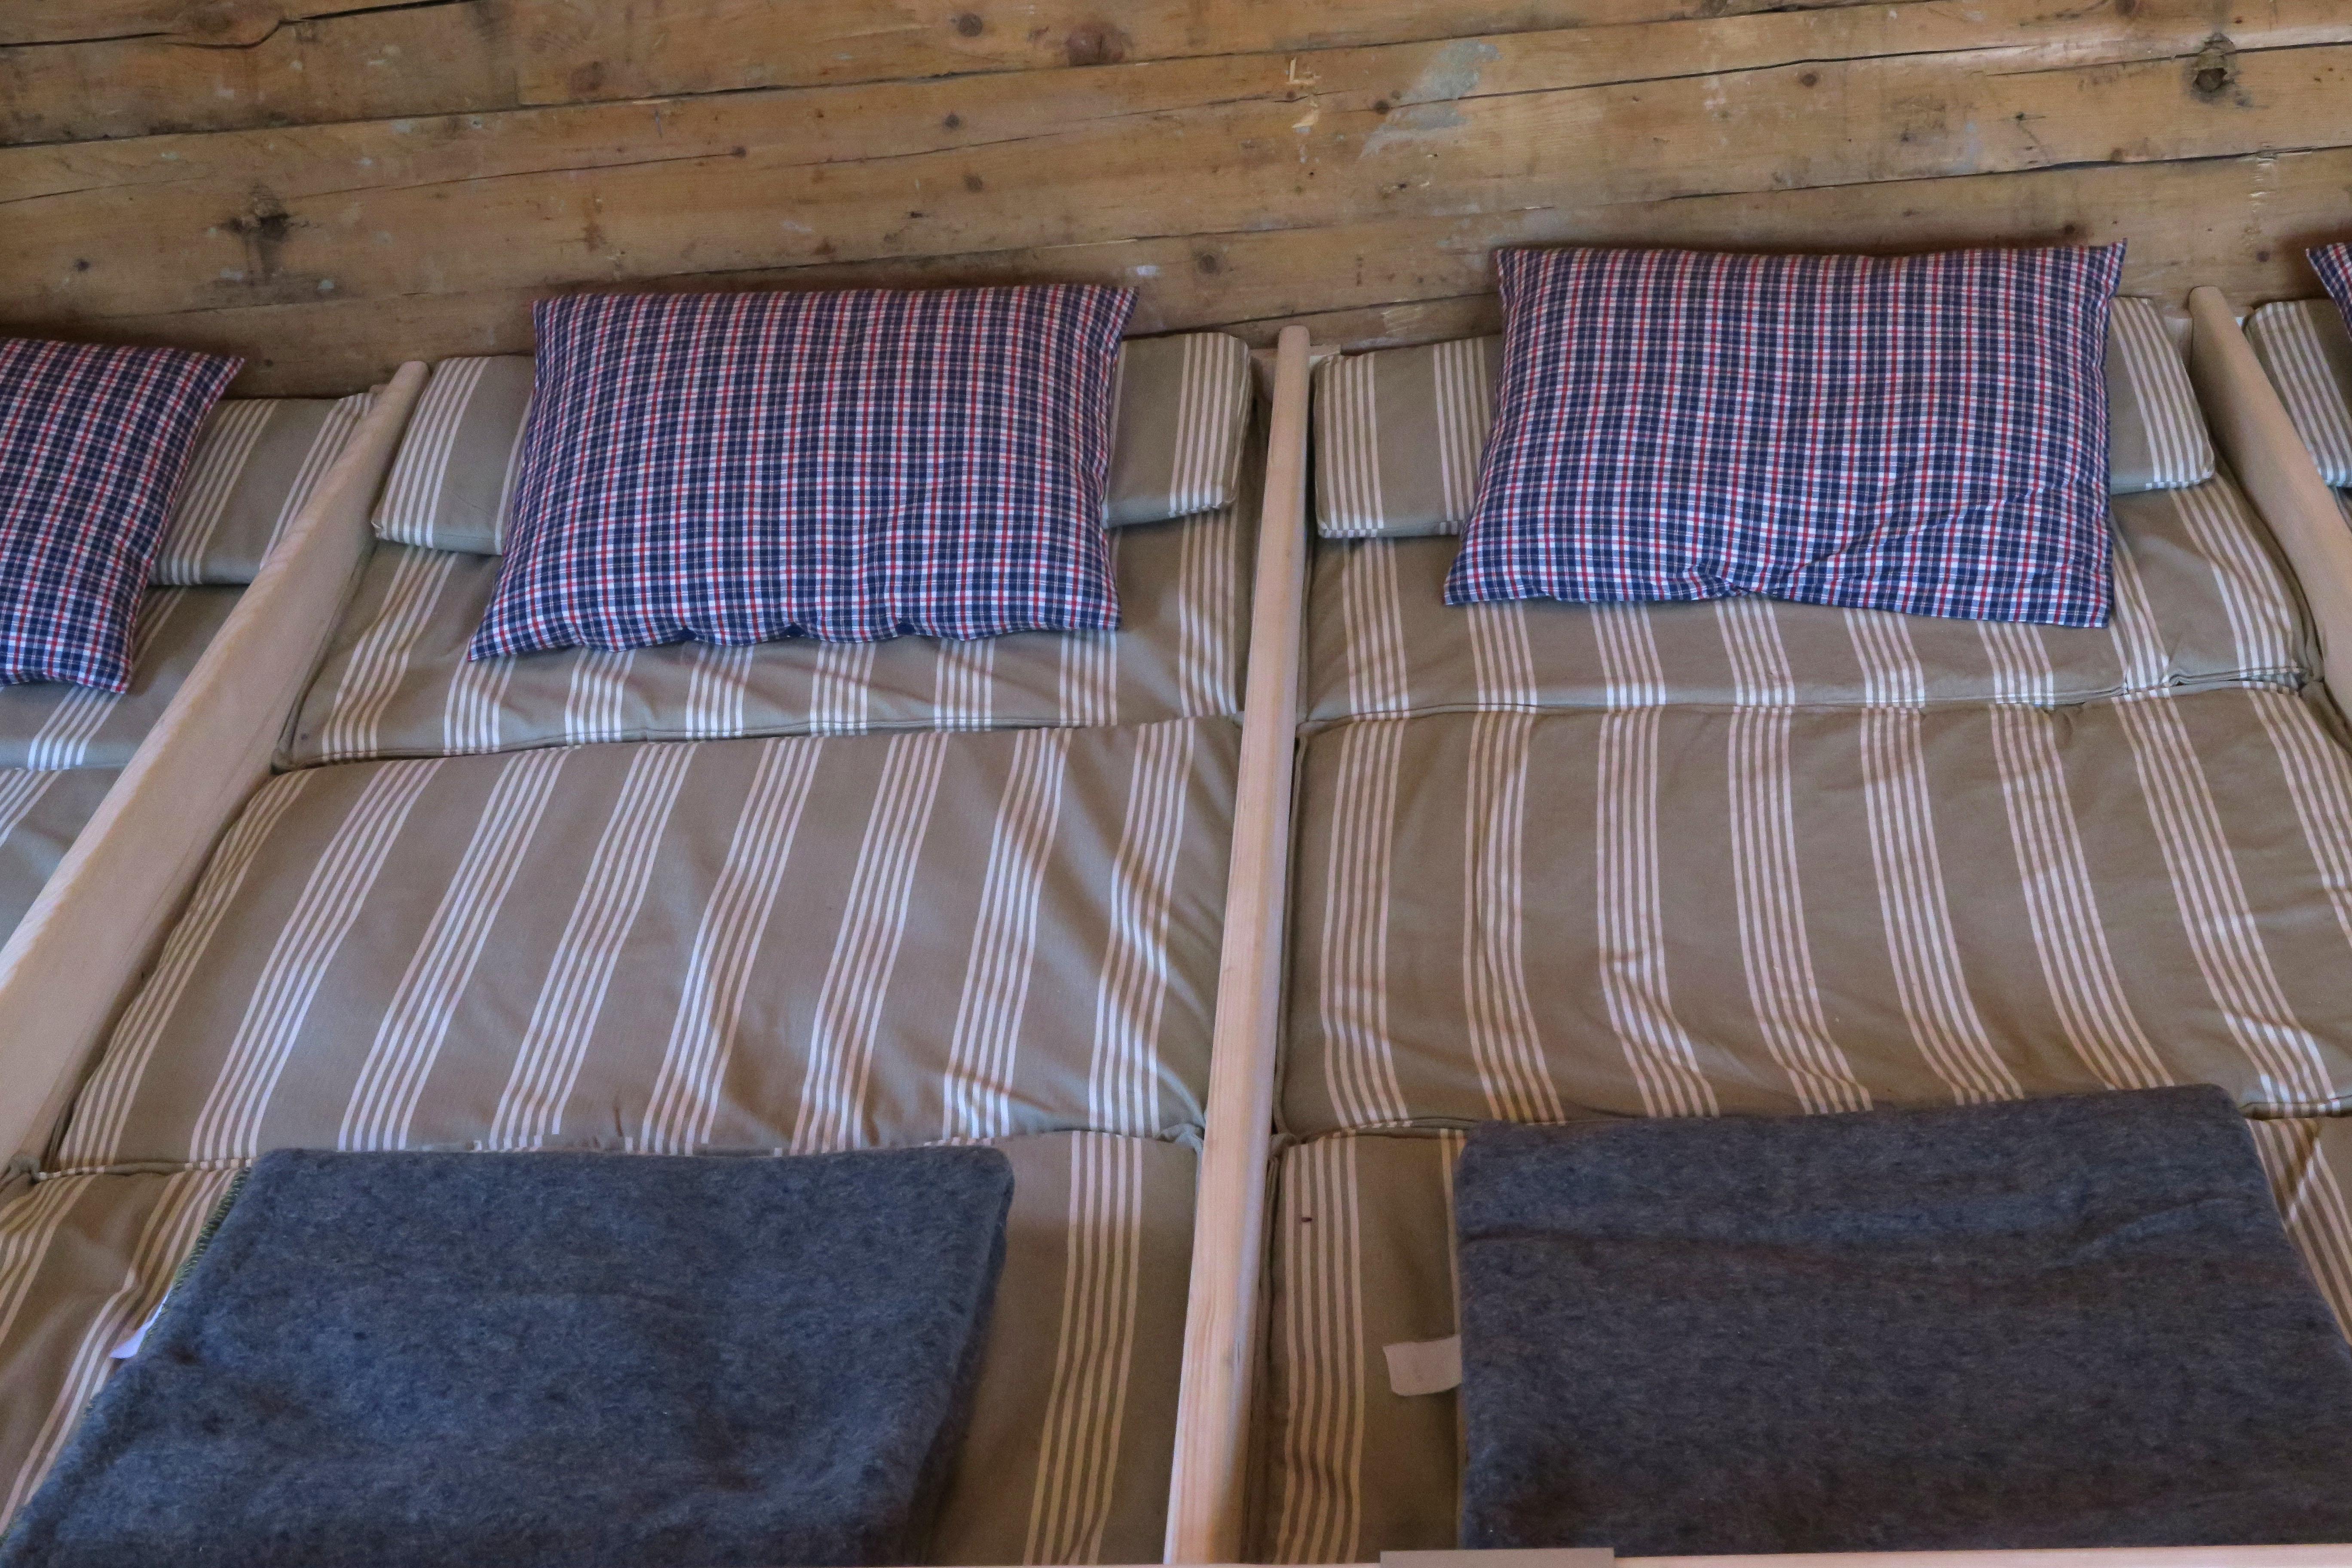 Matratzenlager  File:Matratzenlager in Berghütte.jpg - Wikimedia Commons